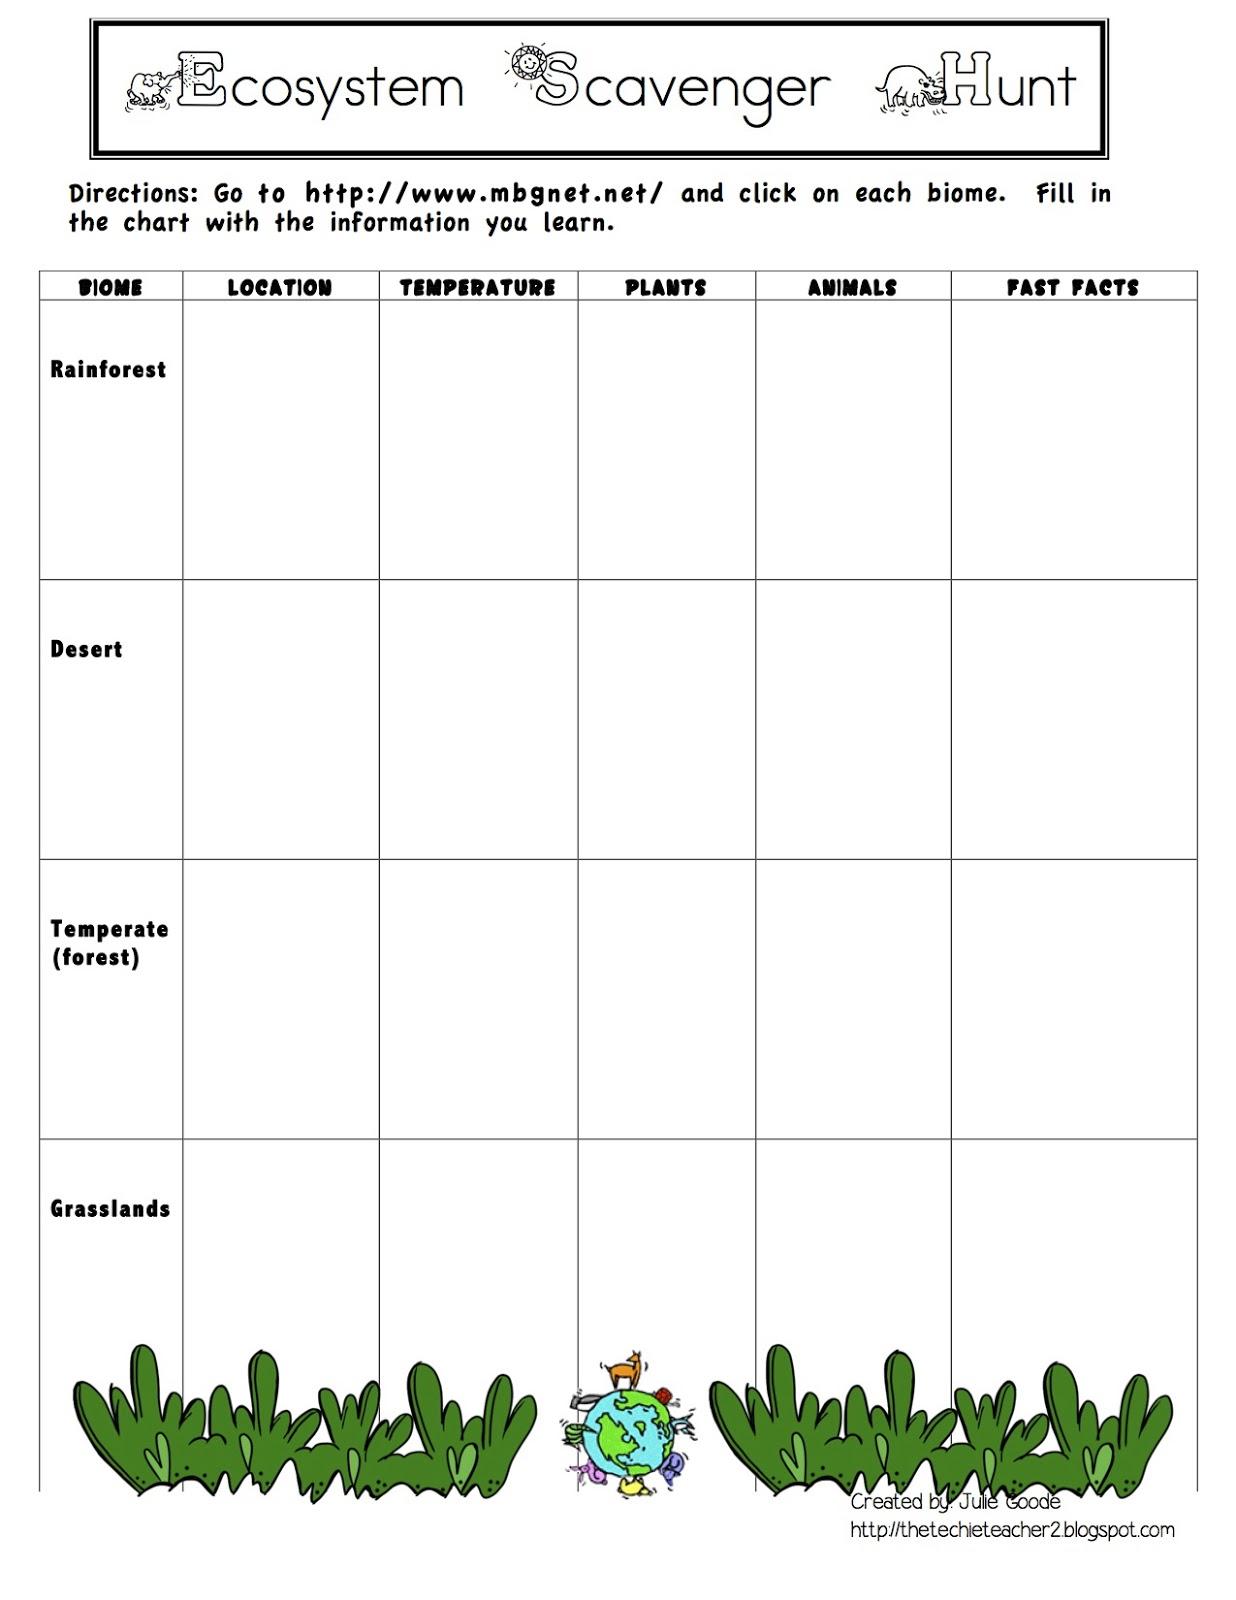 ecosystem habitat biome webquest freebie the techie teacher. Black Bedroom Furniture Sets. Home Design Ideas